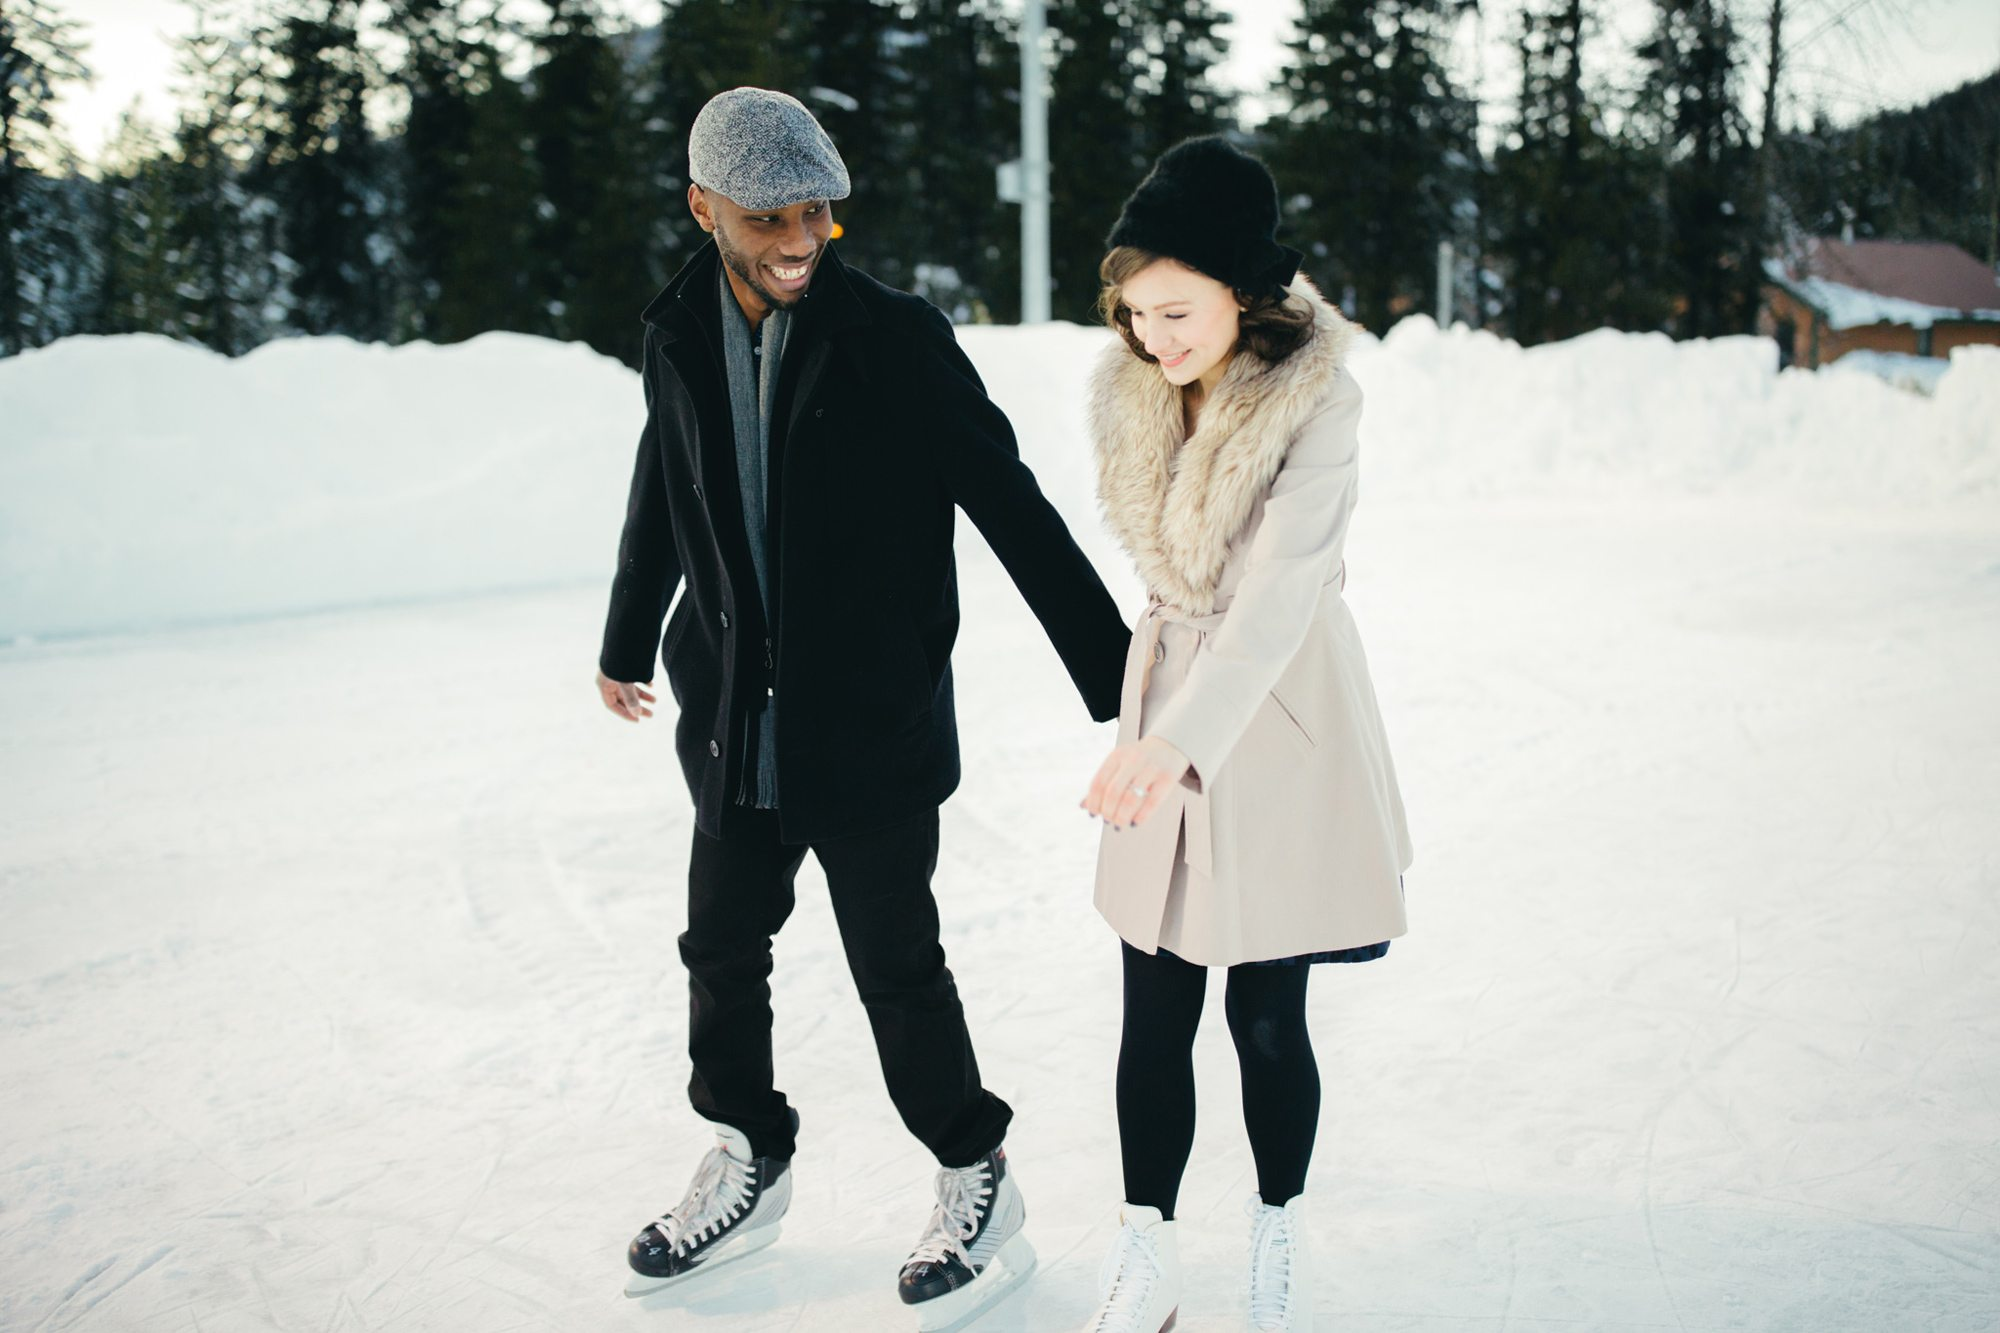 066-adventure-engagement-photographer